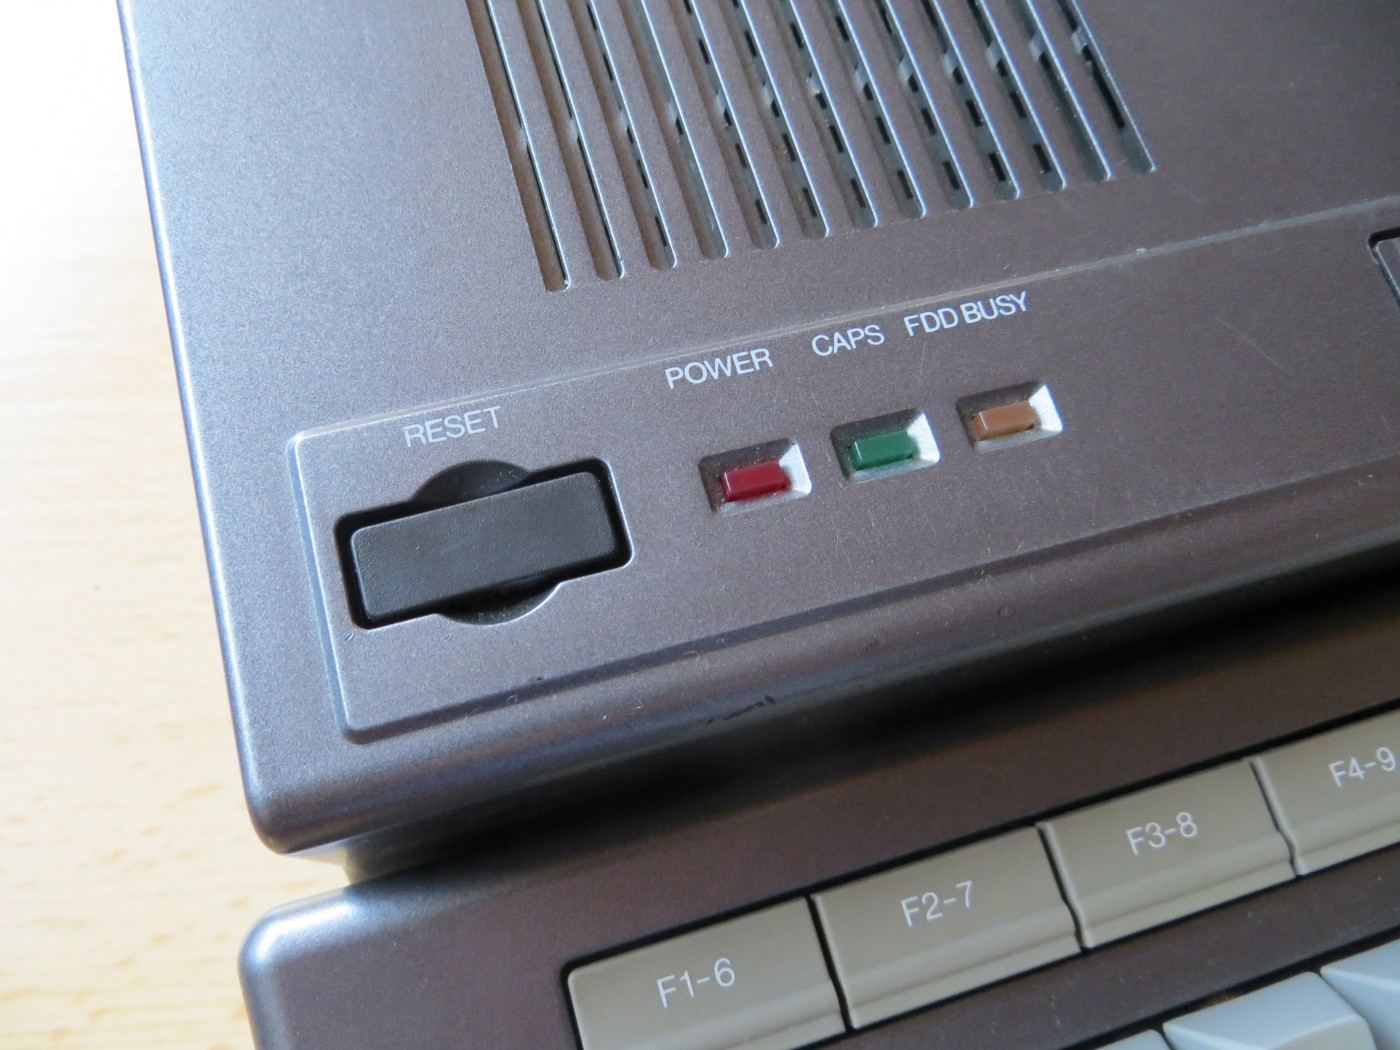 Philips VG-8235 Reset-Taster und Betriebs LEDs